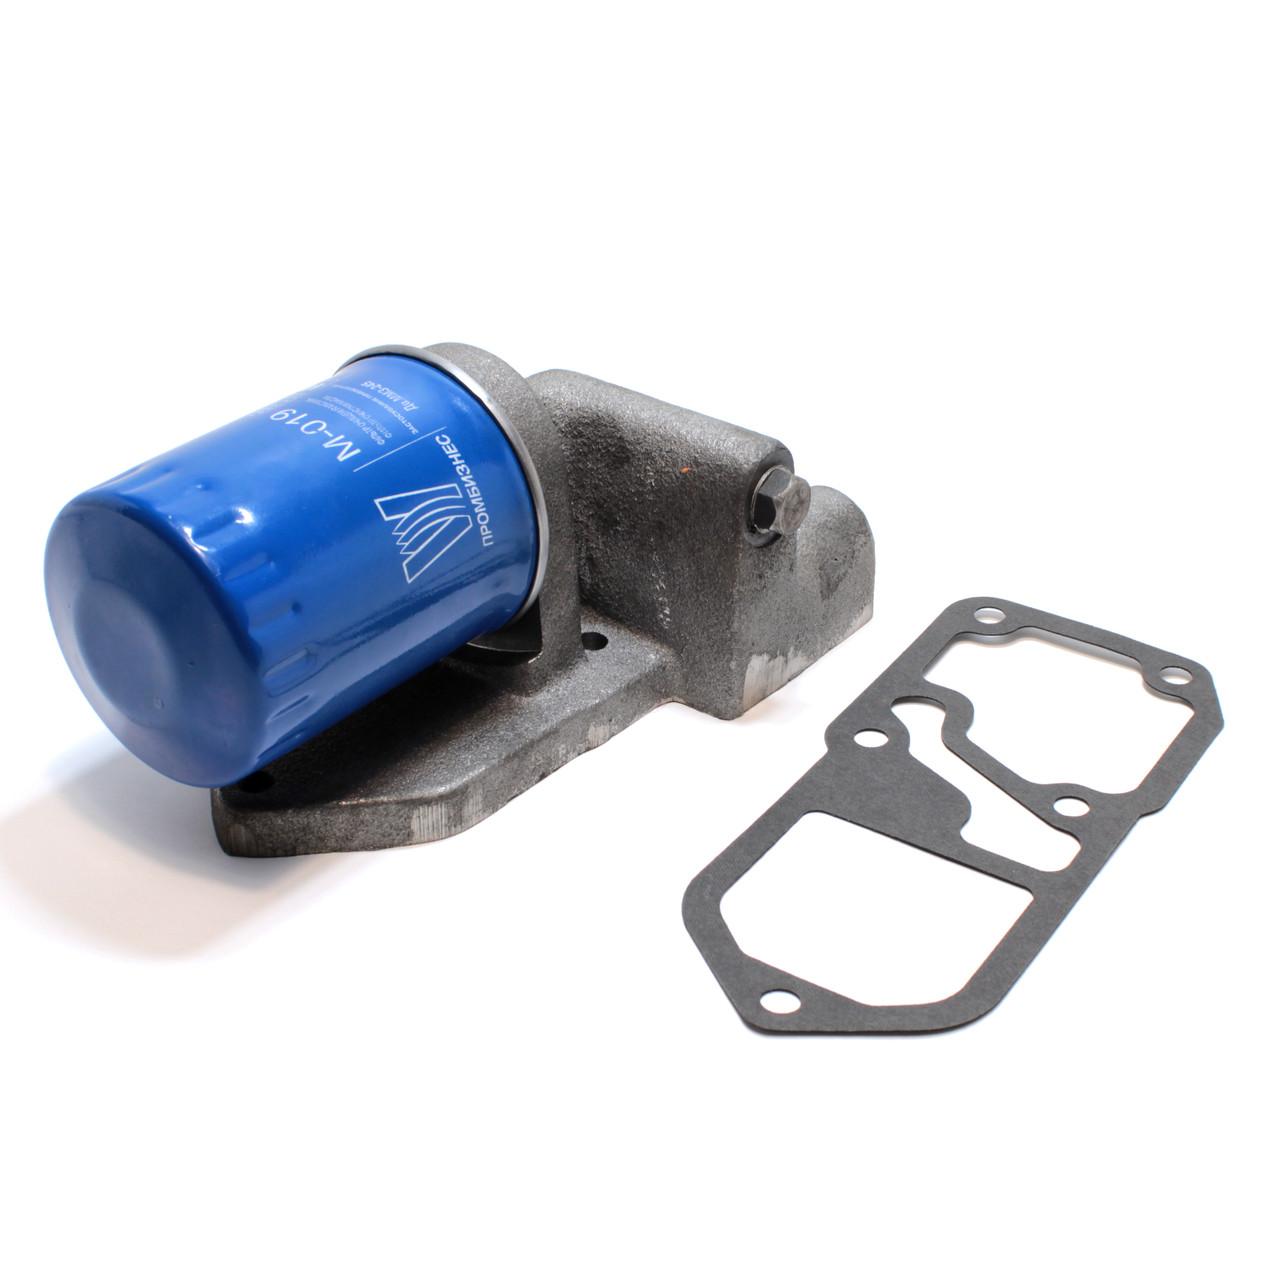 Комплект для установки масляного фильтра ЮМЗ Д-65 вместо центрифуги ФМ-009